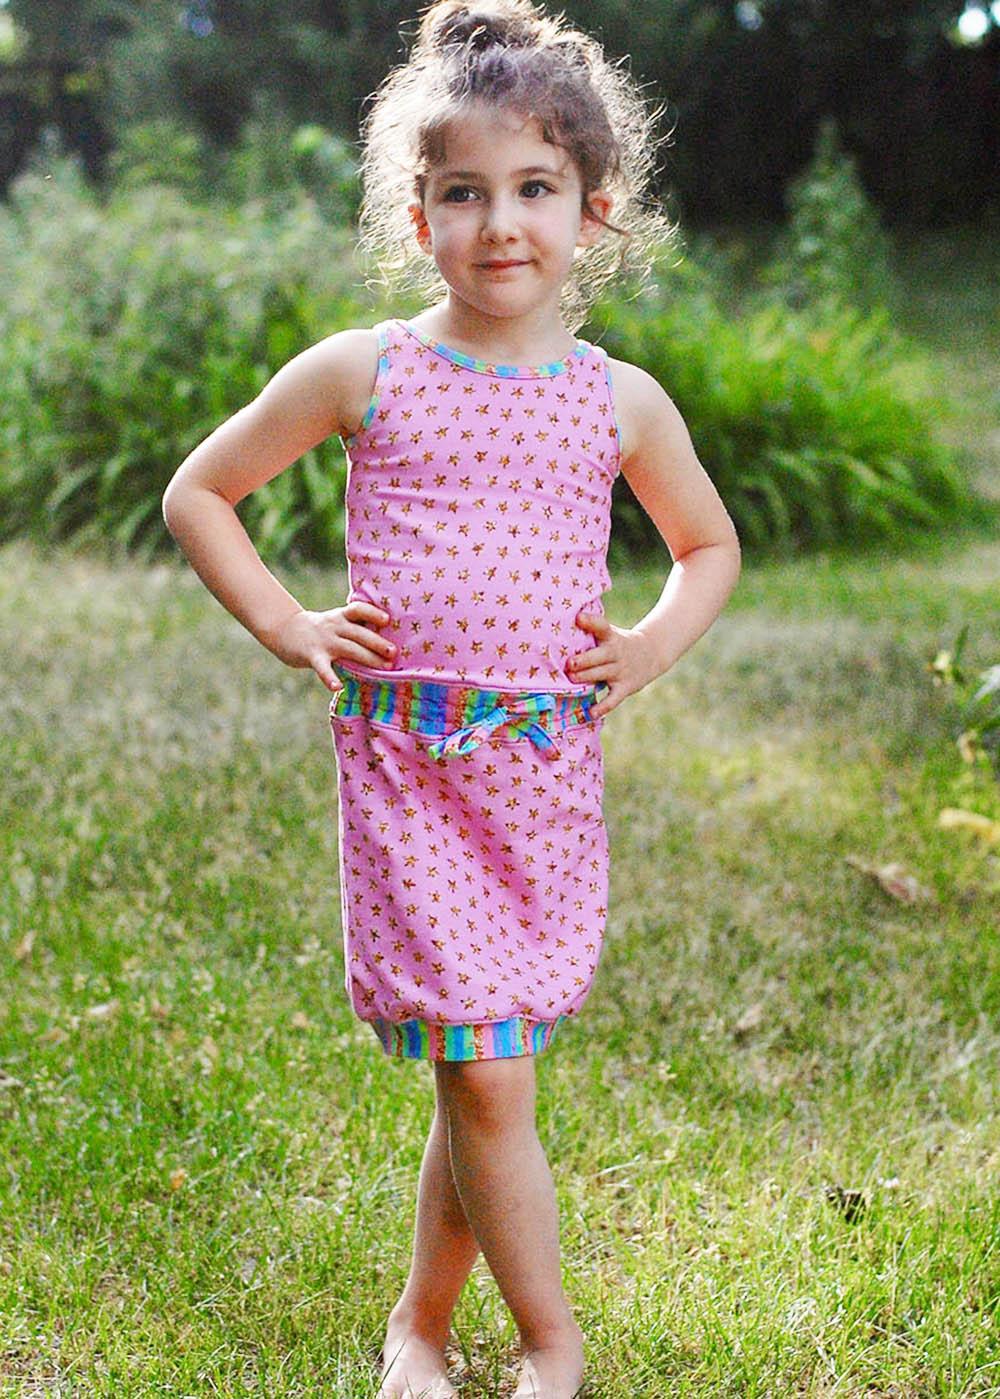 Blondie's Knit Roller Rink Dress Sizes 2T to 14 Kids PDF Pattern